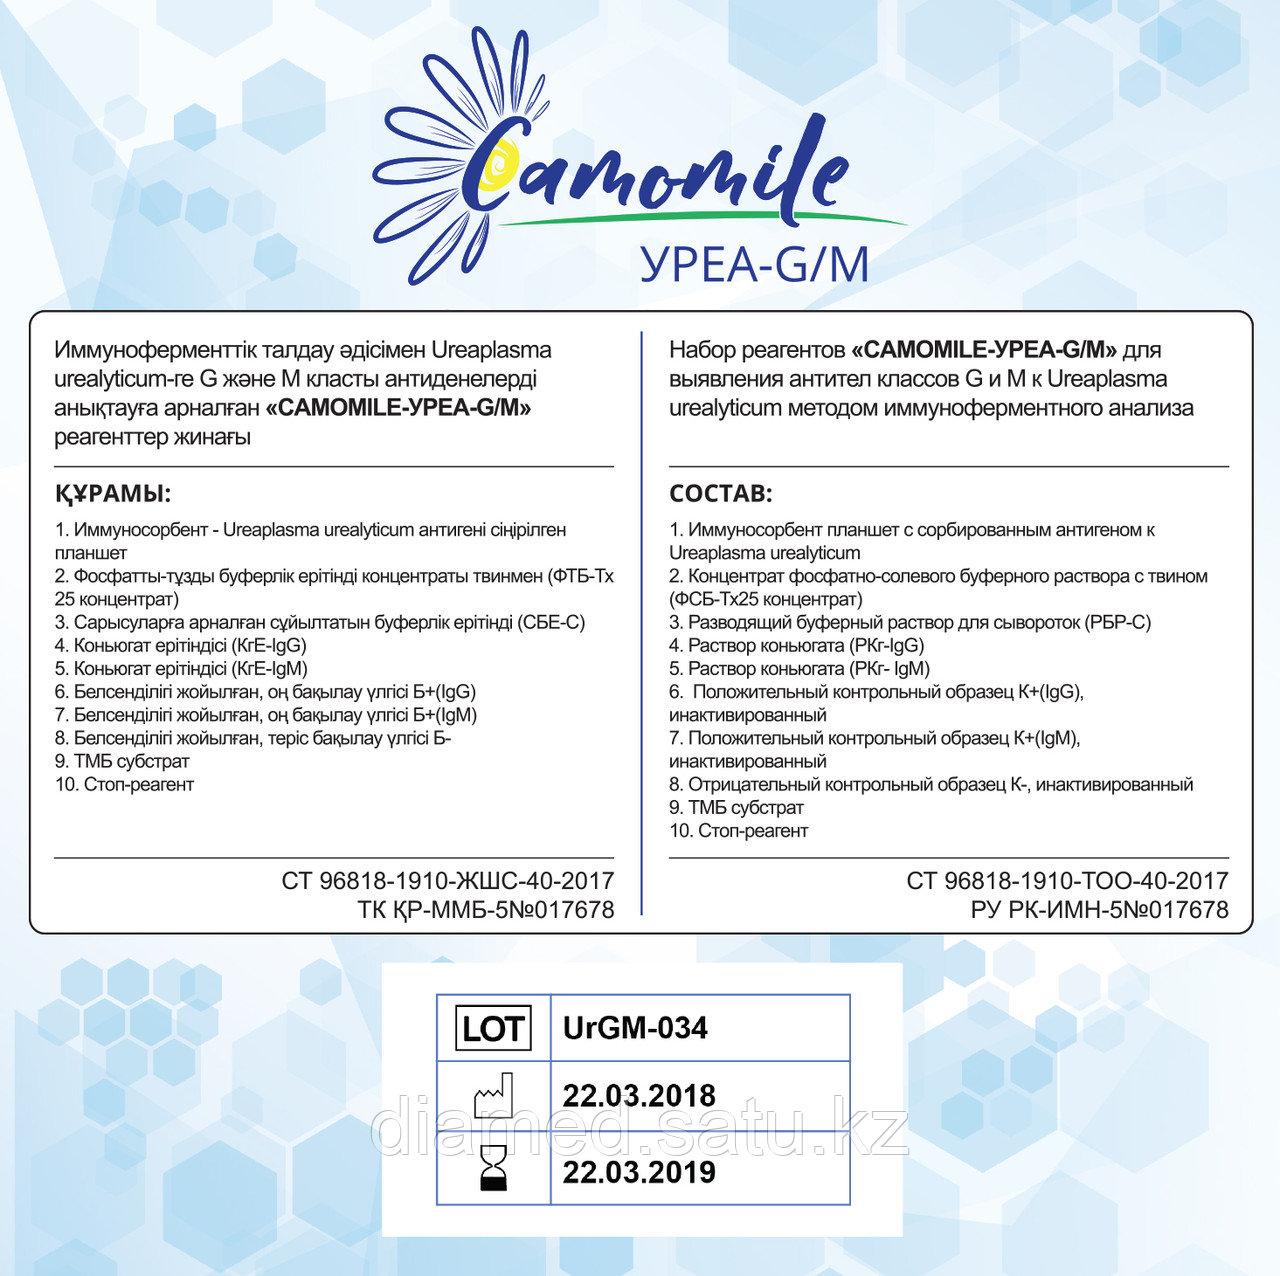 ИФА реагенты CAMOMILE-Уреа-G/М